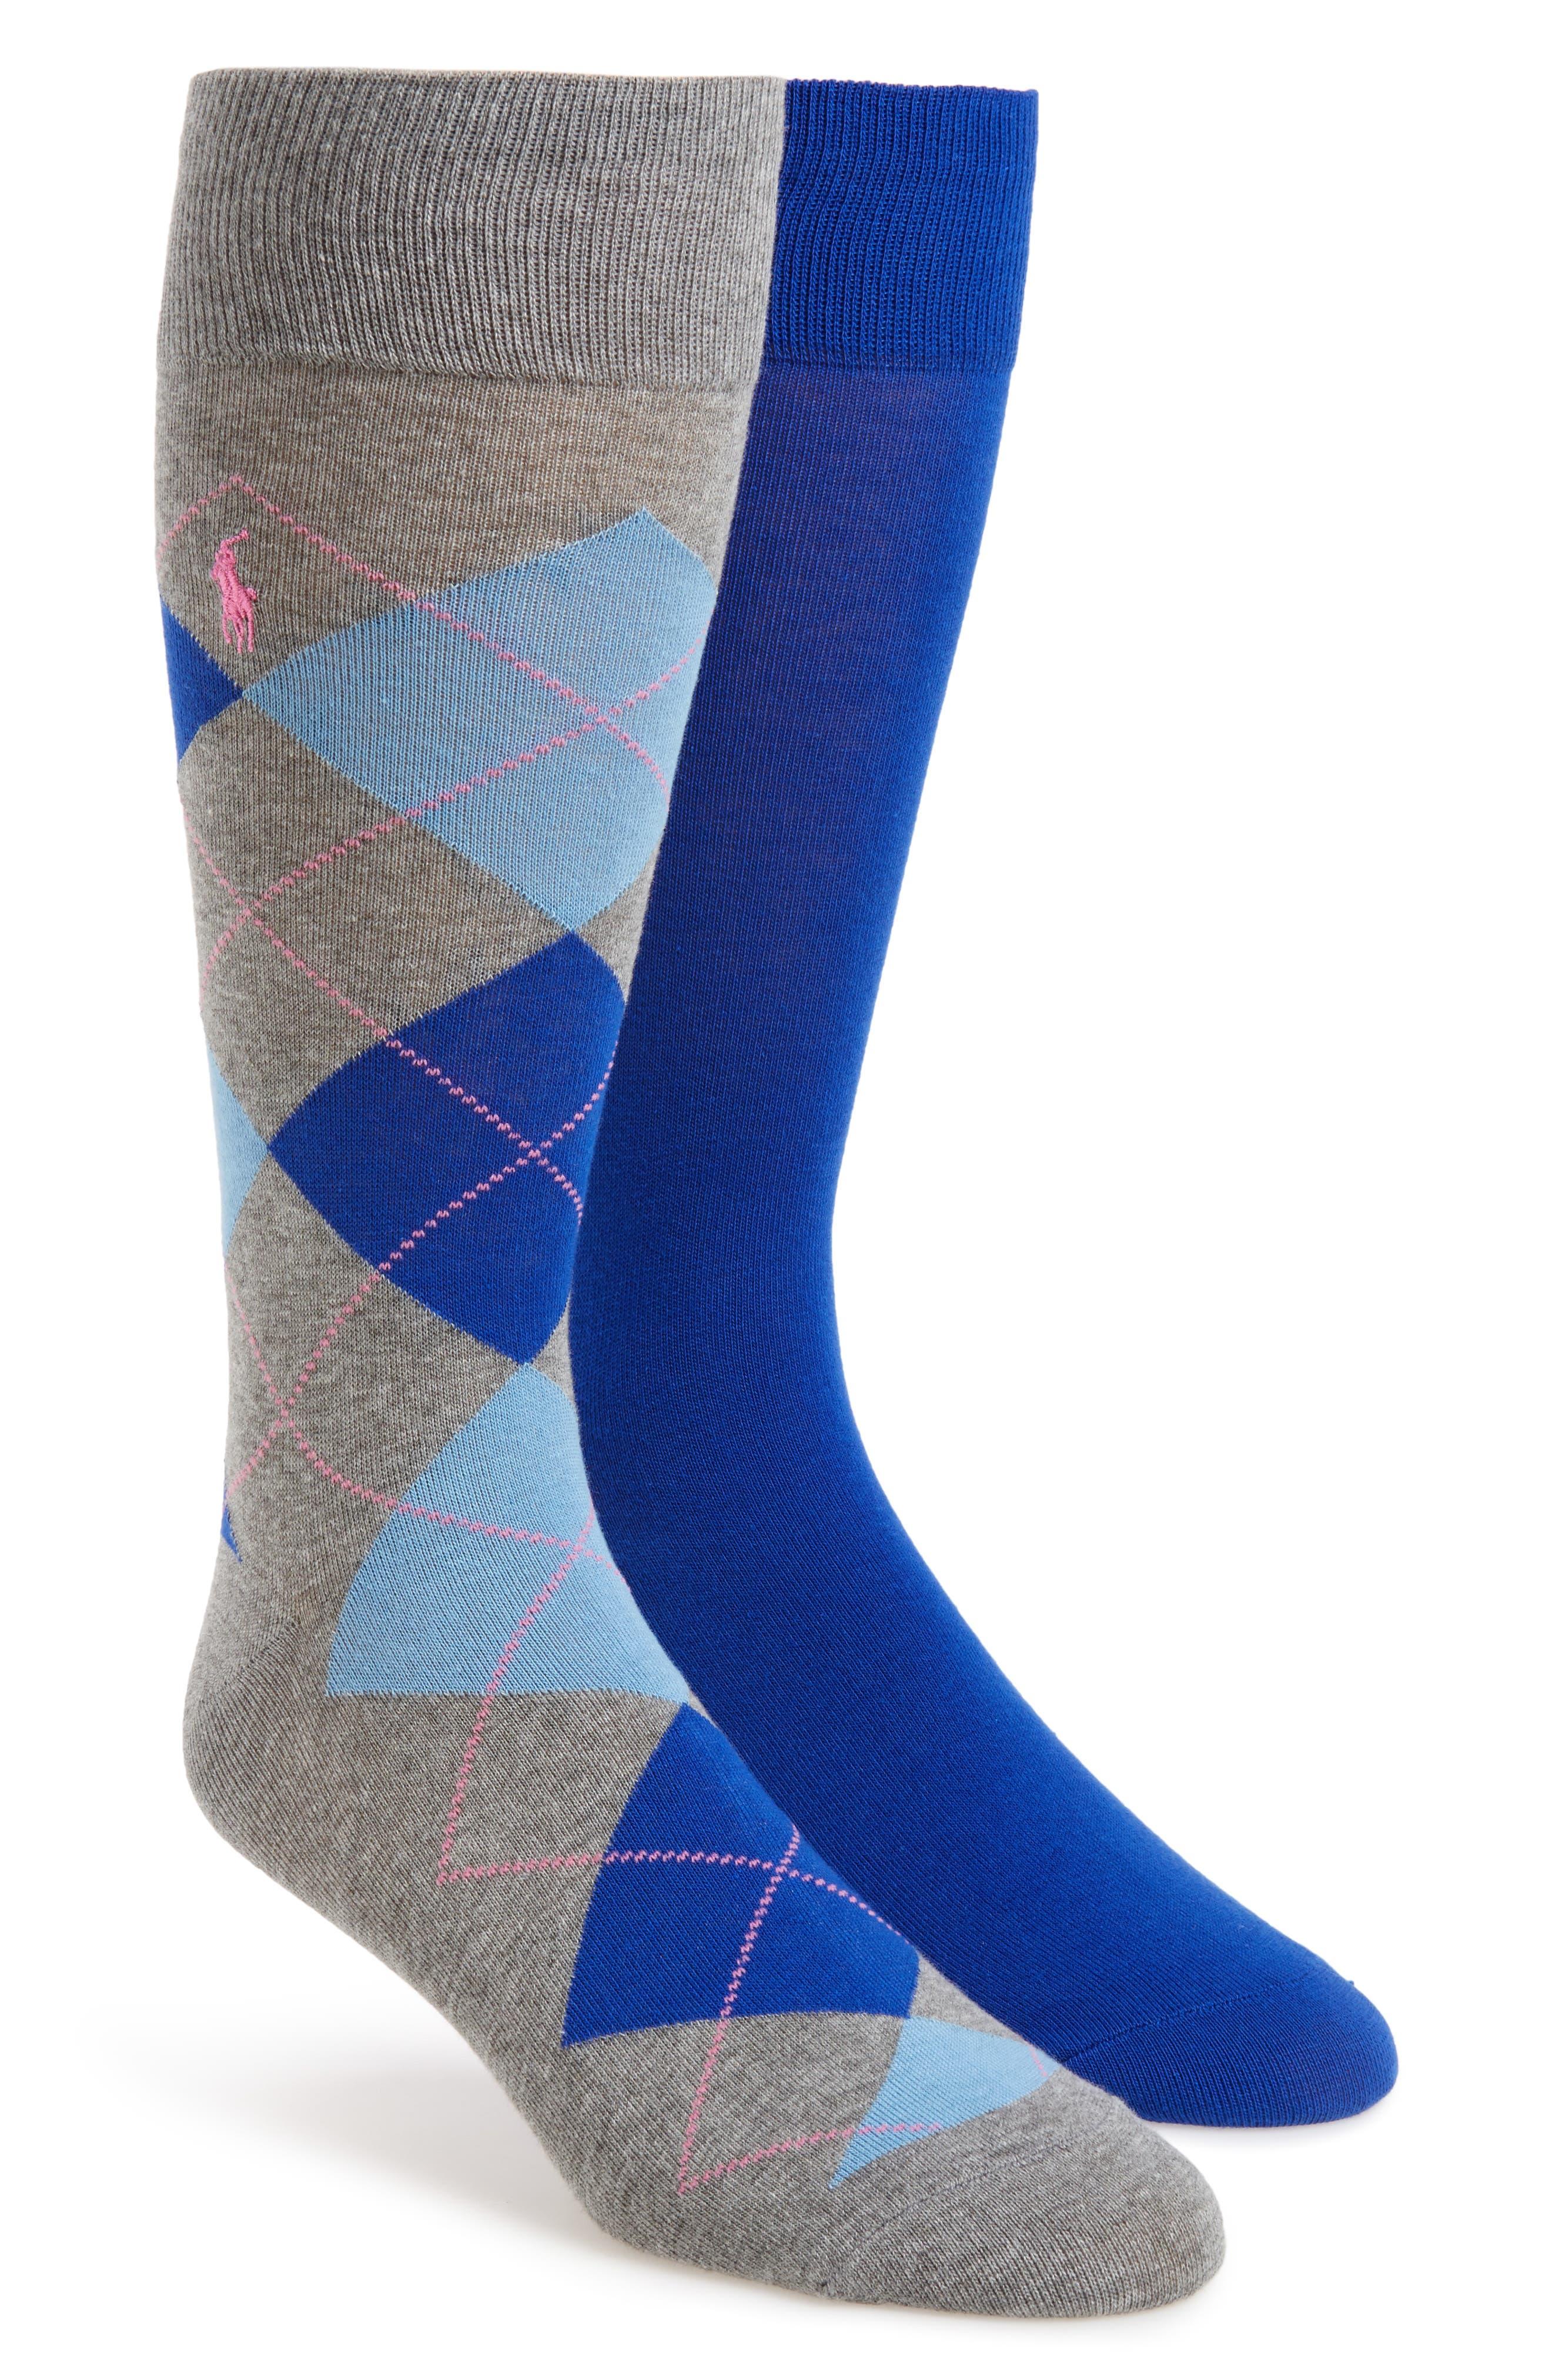 Polo Ralph Lauren Cotton Blend Socks (2-Pack)